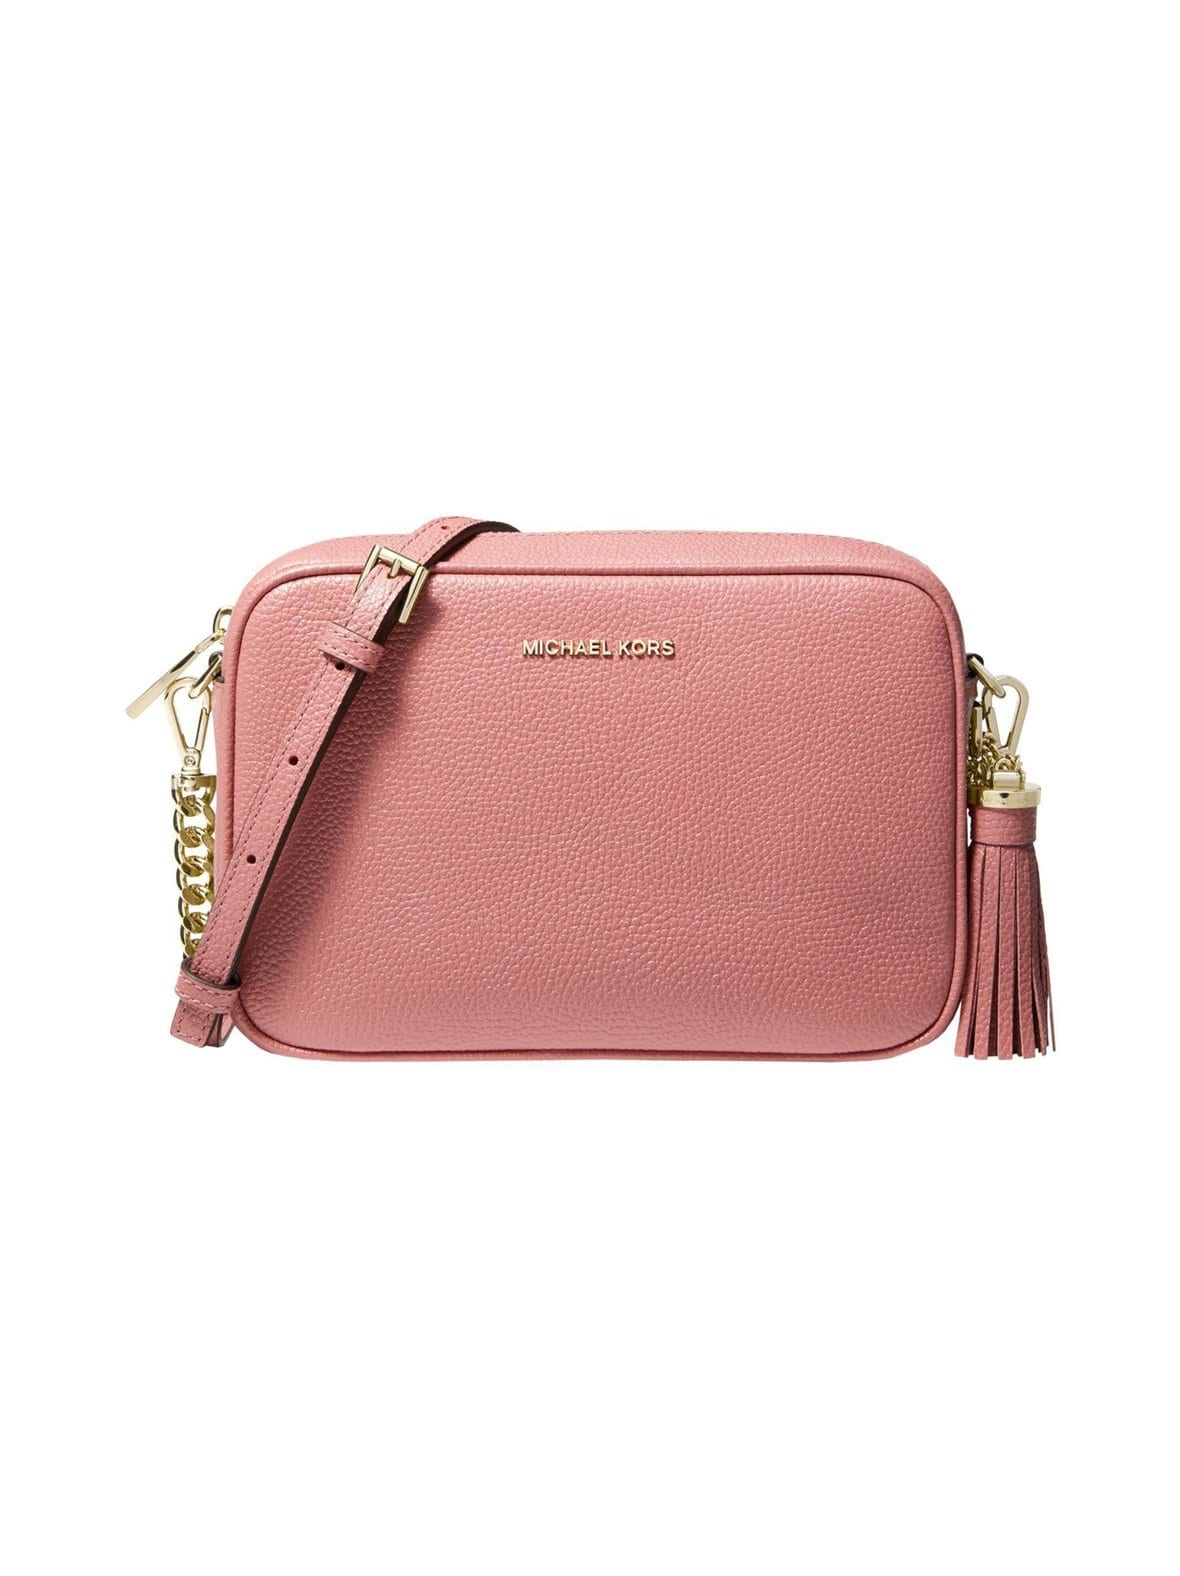 aacec7df9eea2 Rose Michael Michael Kors Ginny Medium Pebbled Leather Camera Bag ...